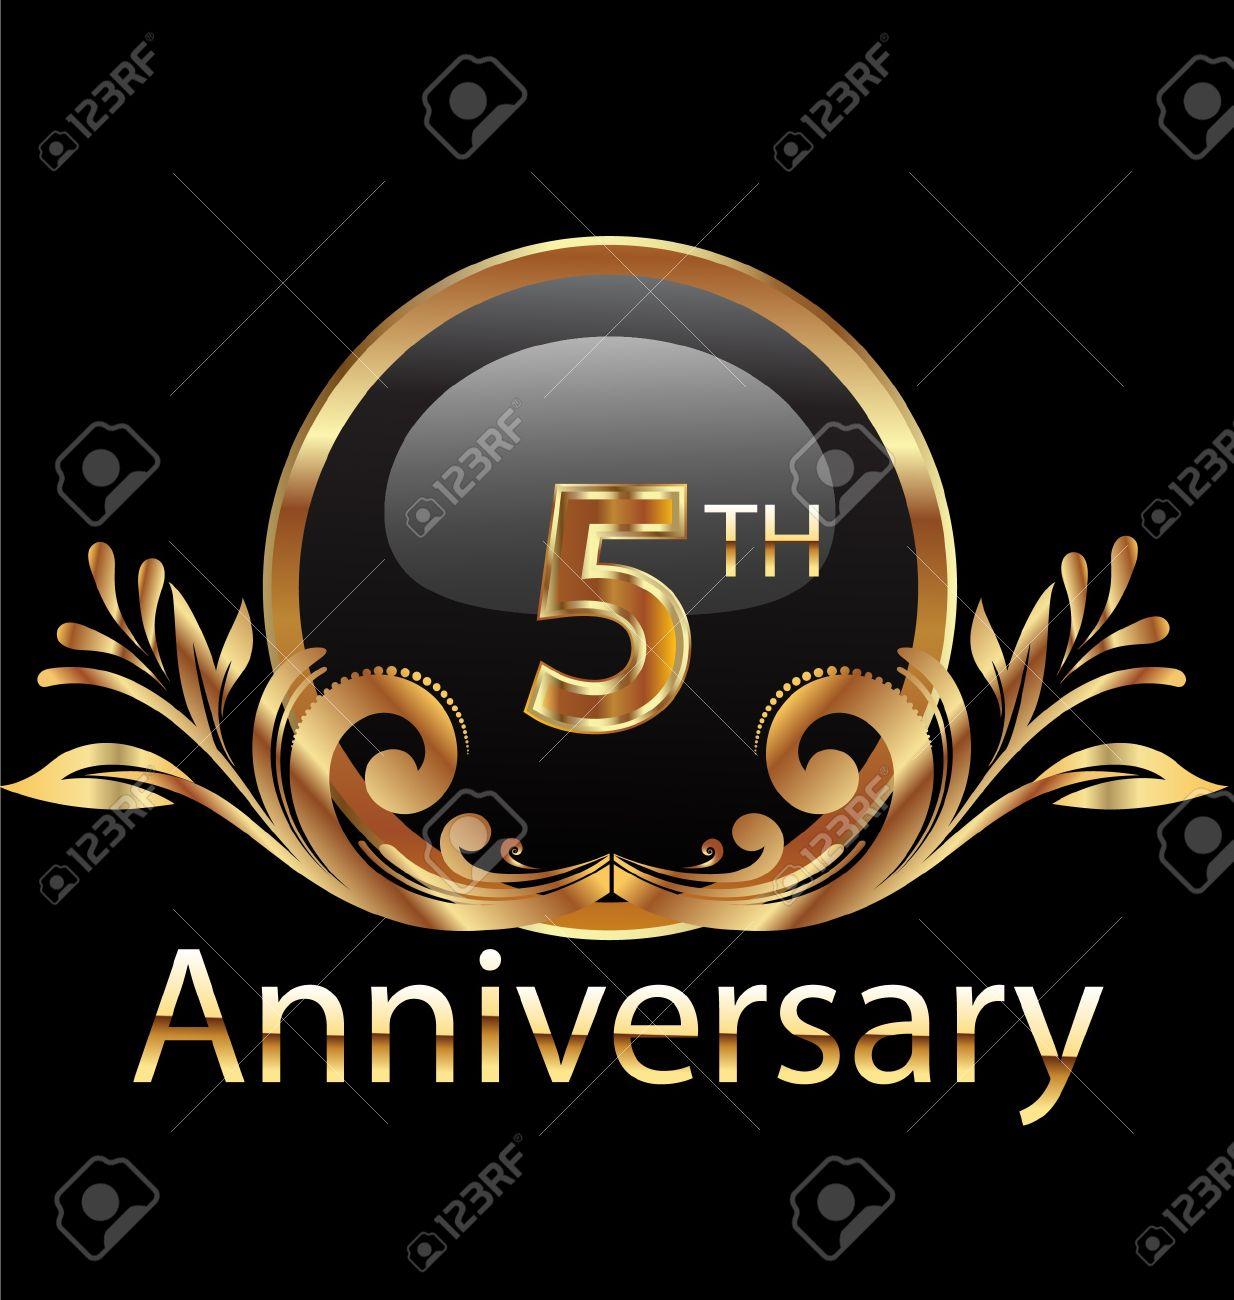 5 years anniversary birthday in gold royalty free cliparts 5 years anniversary birthday in gold stock vector 19057234 biocorpaavc Gallery